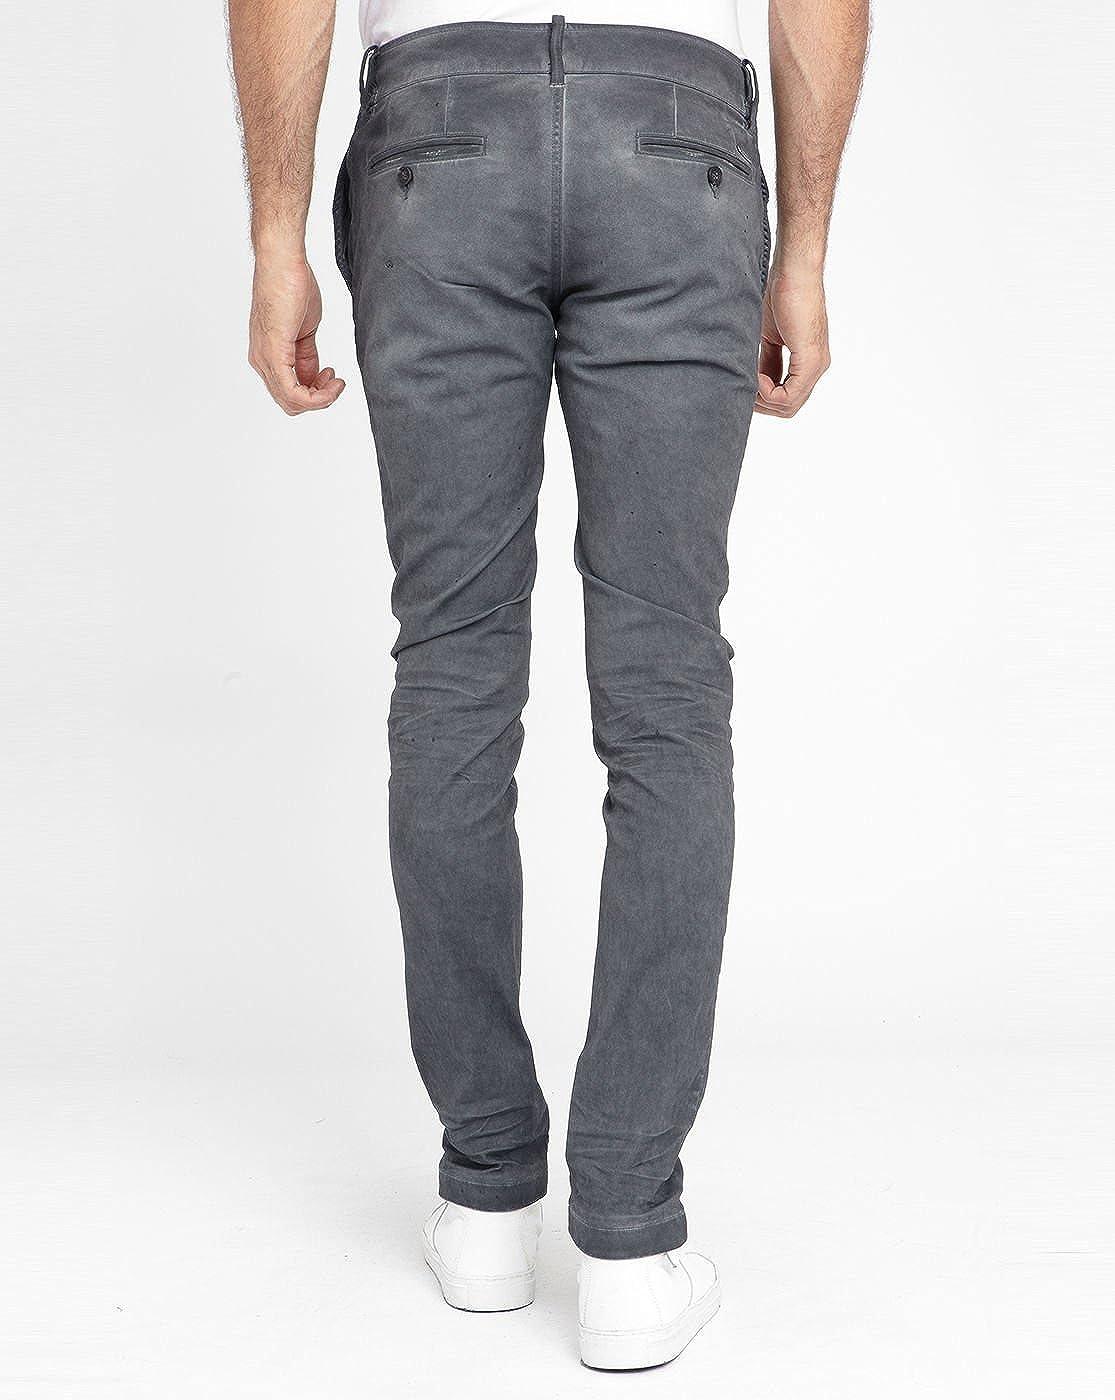 2ef5dda9 DIESEL - Chinos - Men - Charcoal Grey Chi-Shaped Chinos for men - 30|32:  Amazon.co.uk: Clothing